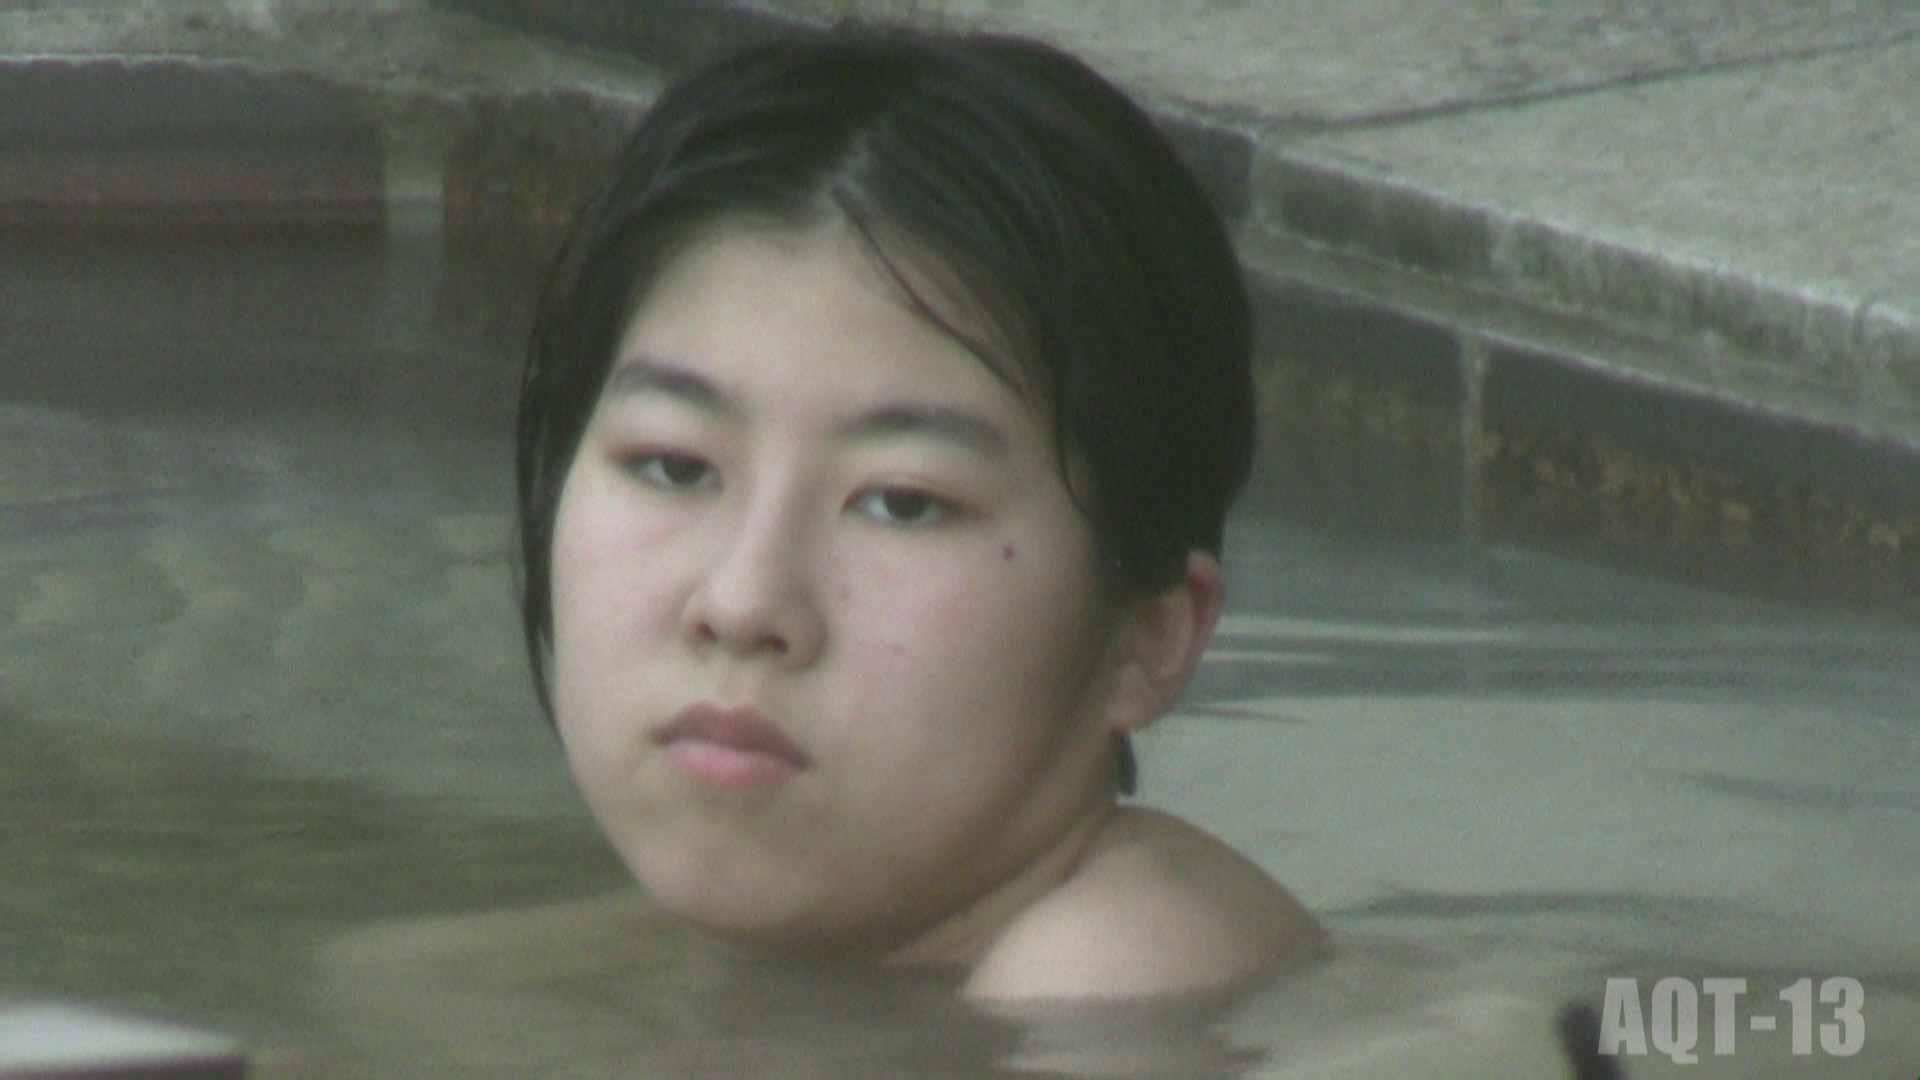 Aquaな露天風呂Vol.816 露天 AV動画キャプチャ 105PICs 29